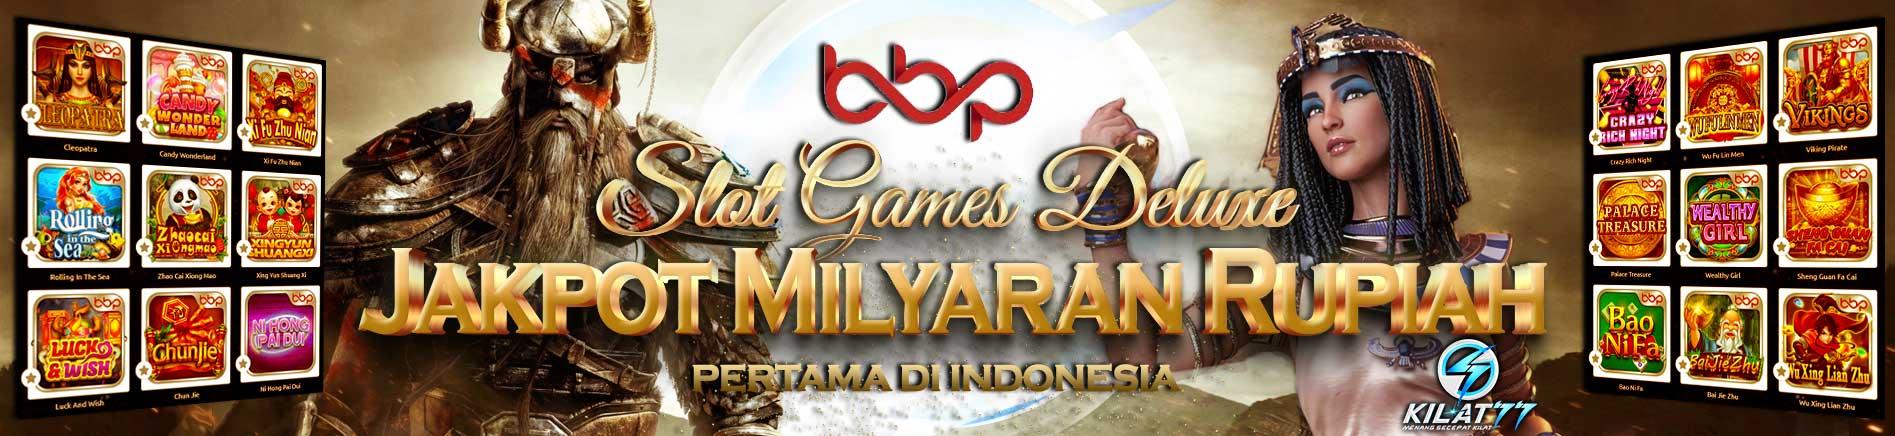 BBP Slot Online Jackpot Milyaran Rupiah